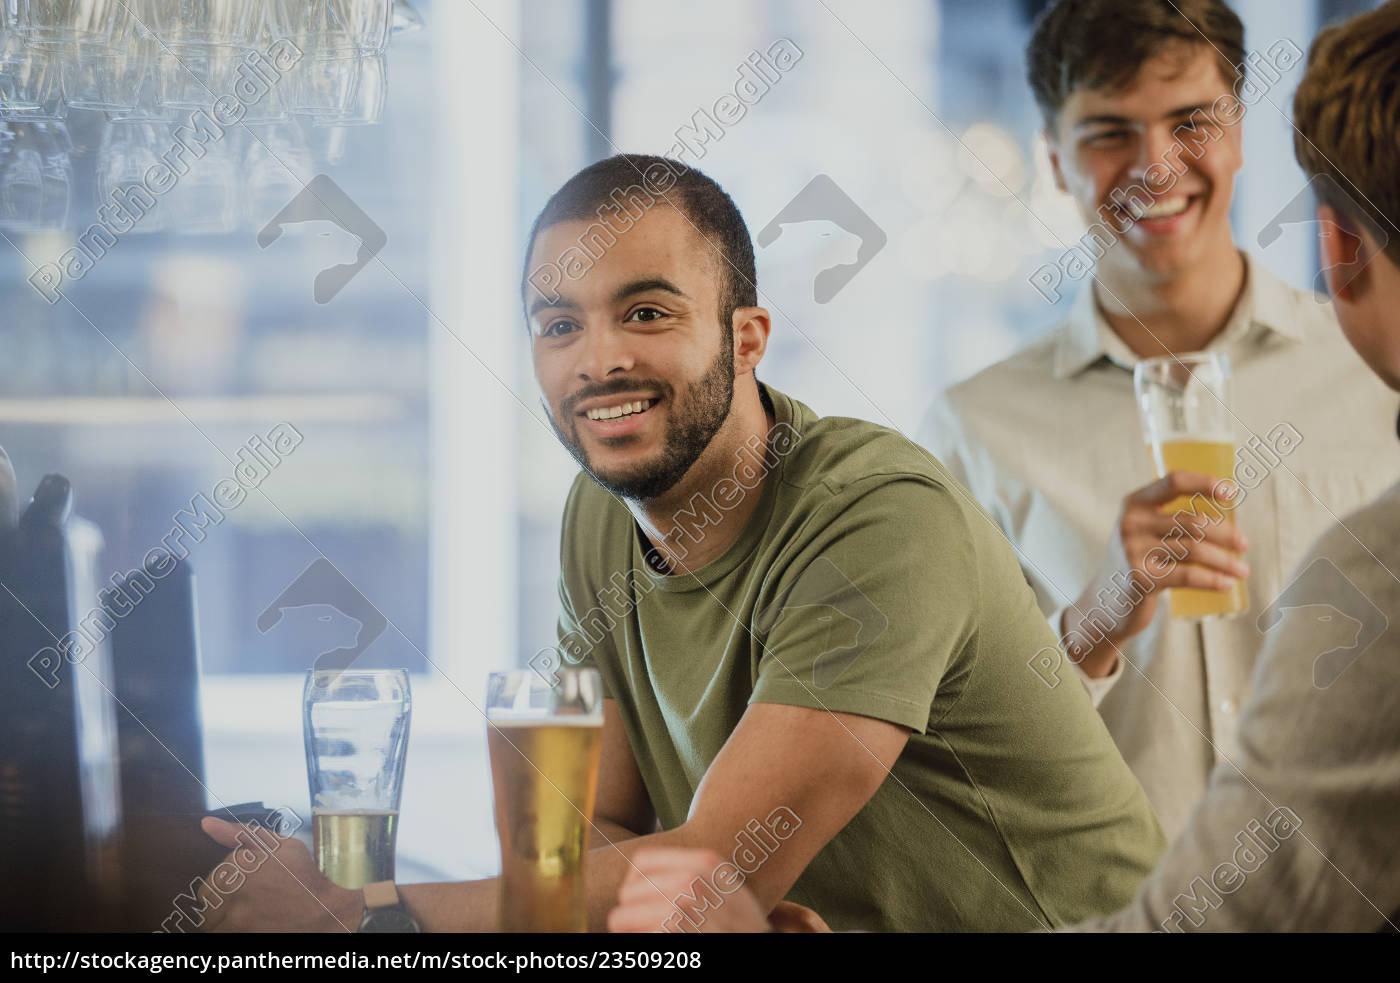 men, buying, drinks, at, the, bar - 23509208